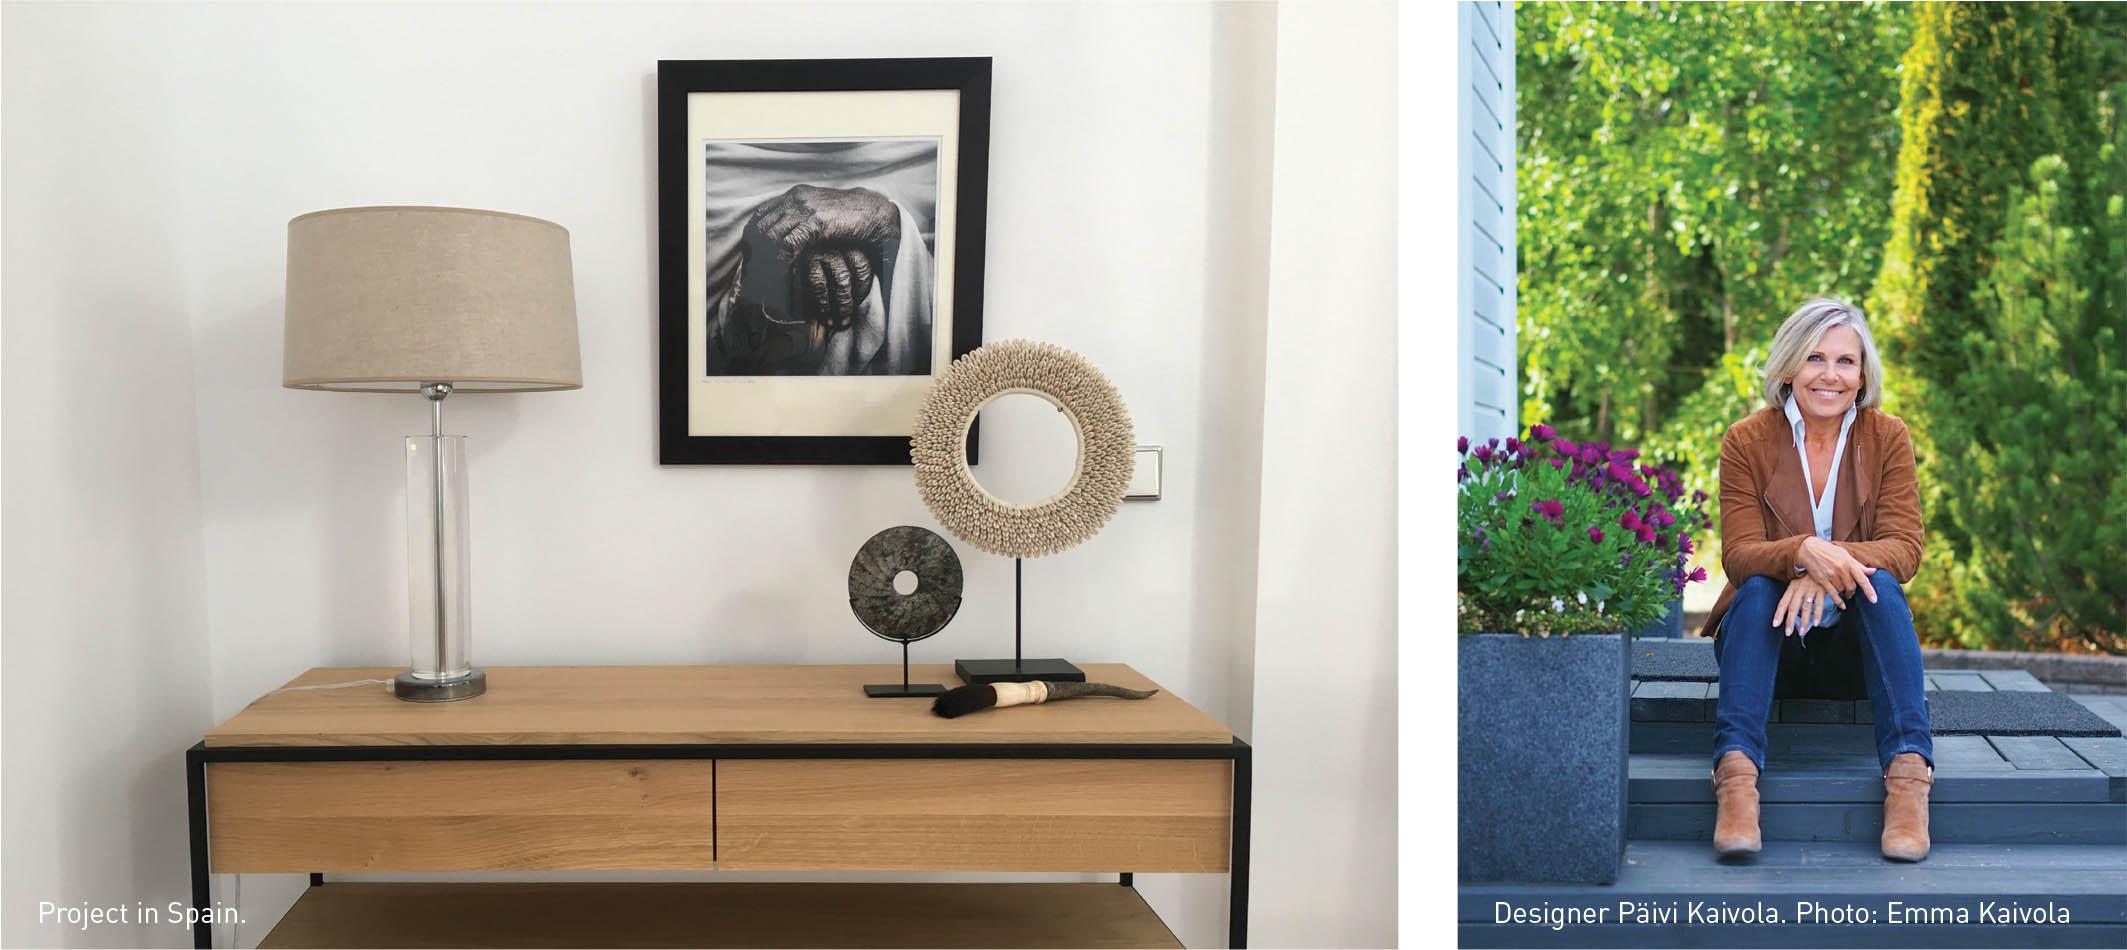 Left: Project in Spain. Right: Designer Päivi Kaivola. Photo: Emma Kaivola. Sisustamo, Designing practical and beautiful spaces, Scan Magazine